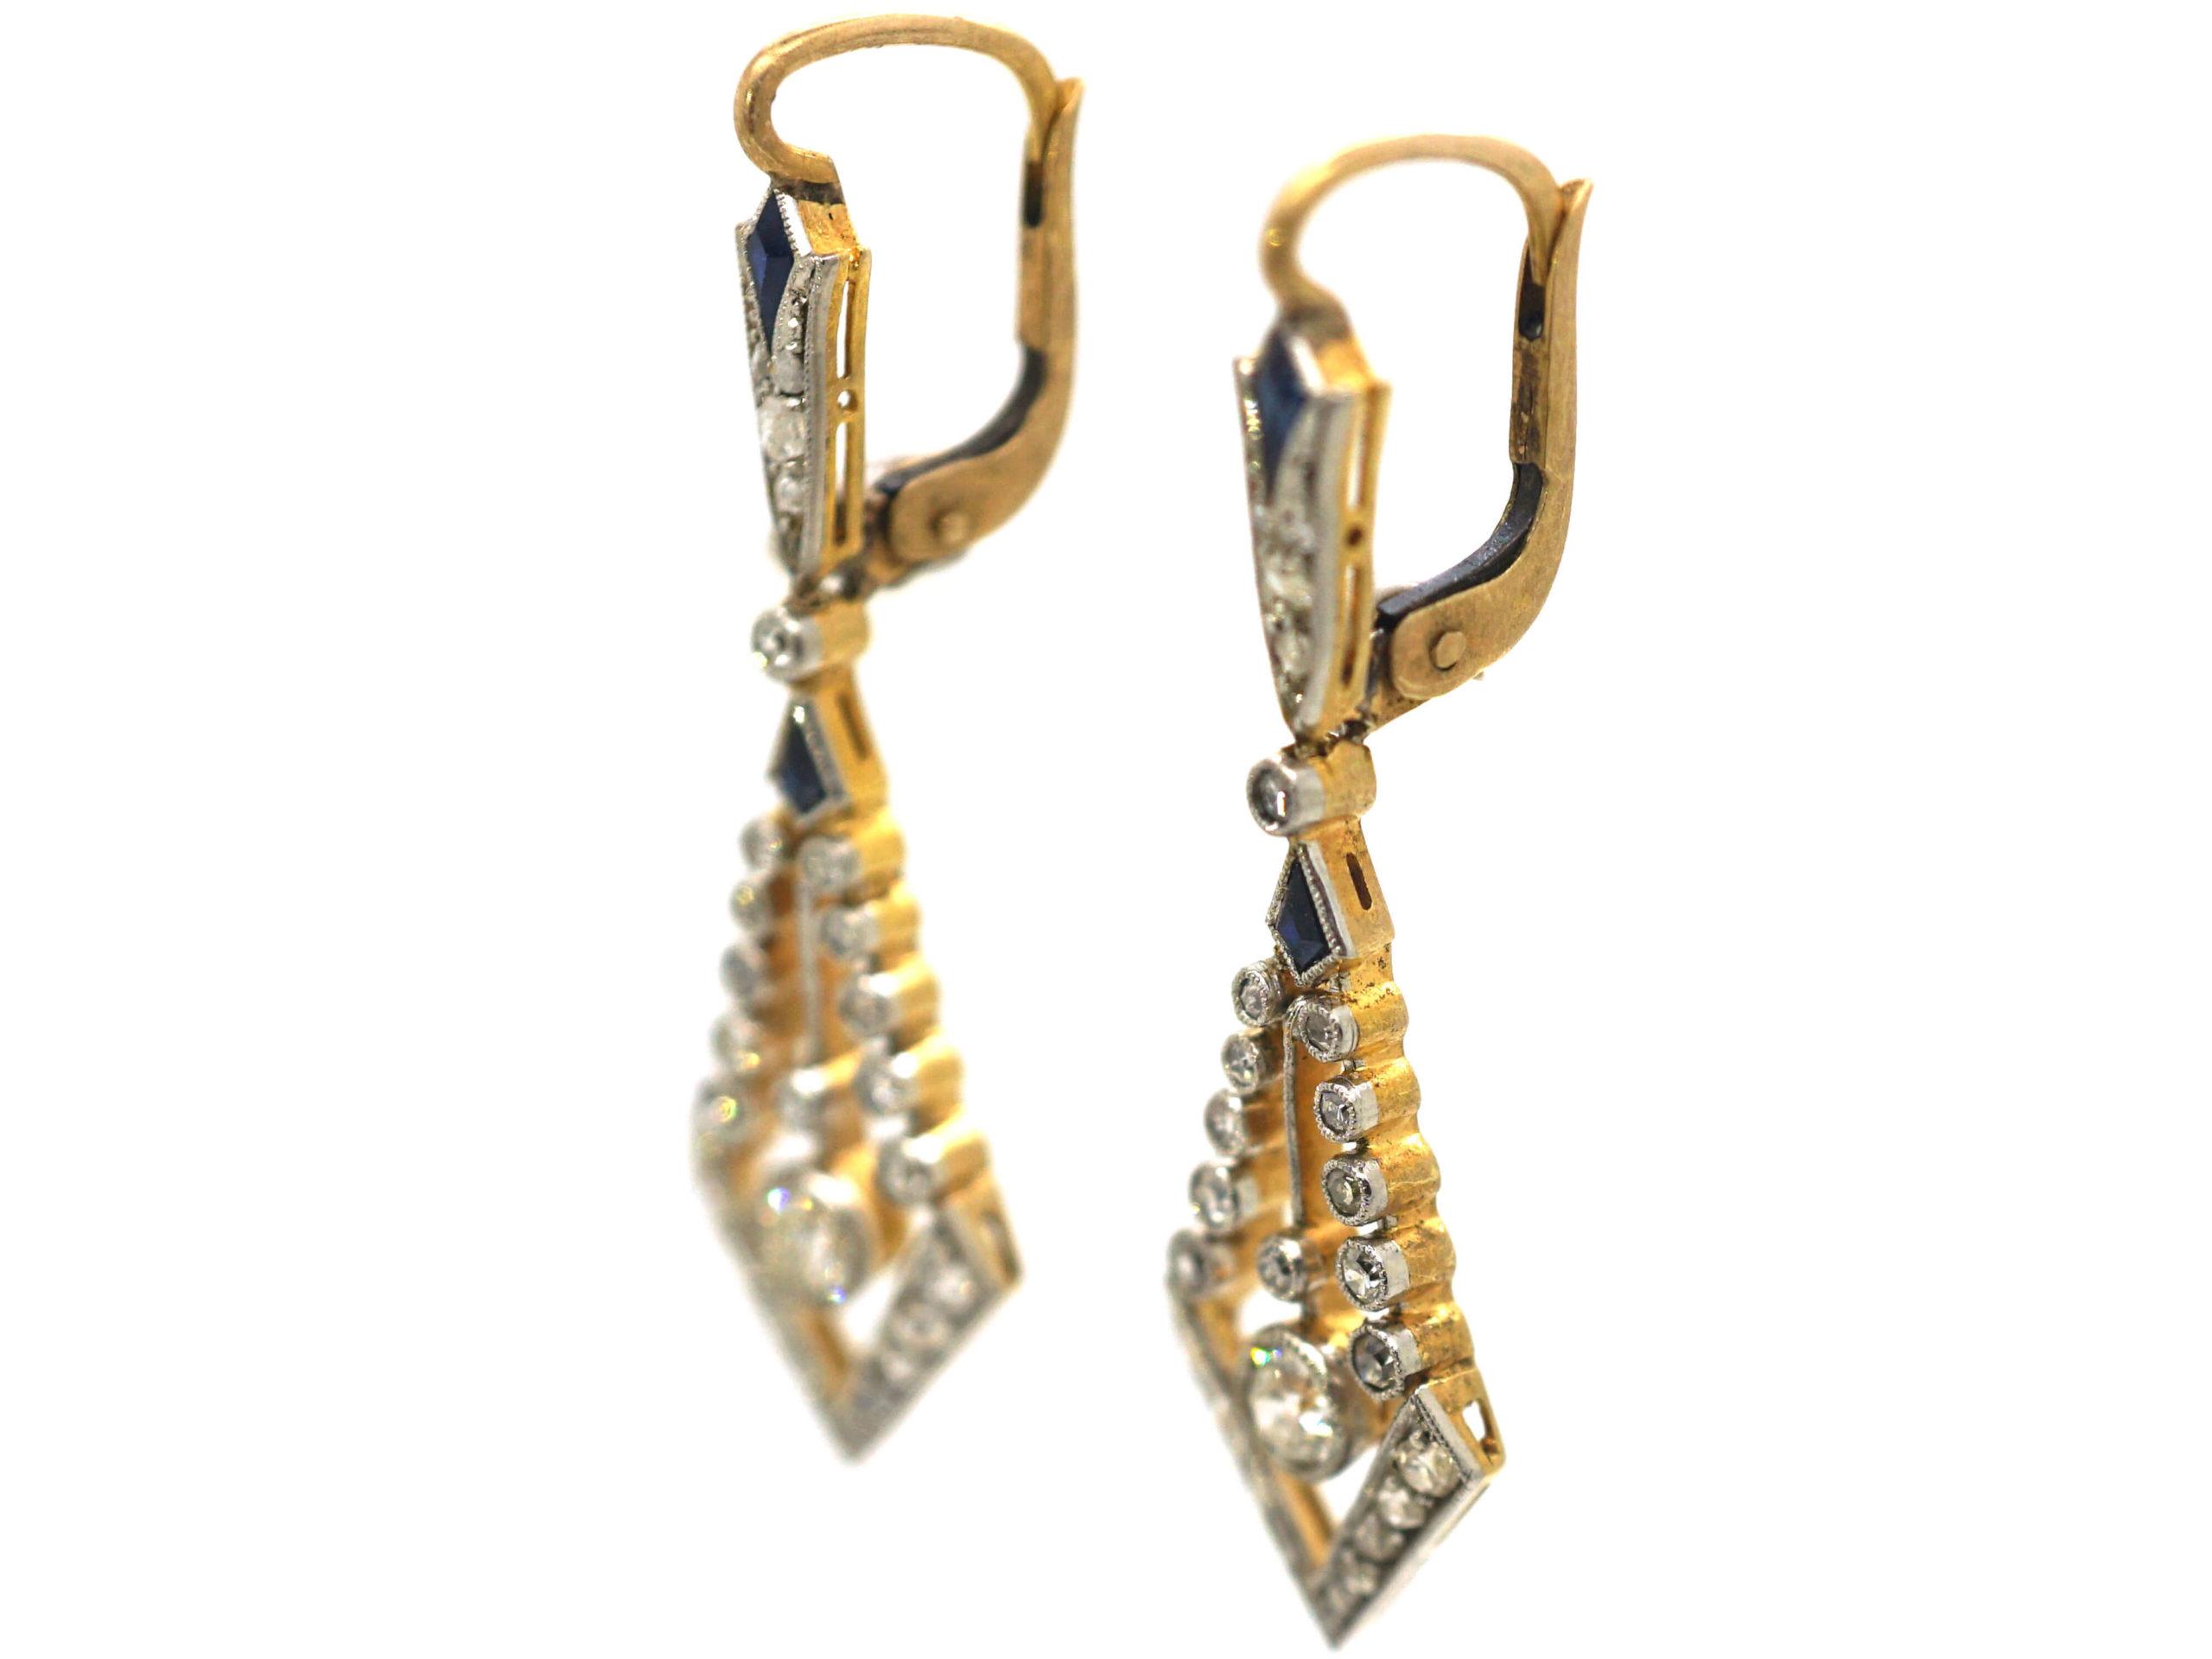 Art Deco 18ct Gold & Platinum, Sapphire & Diamond Drop Earrings